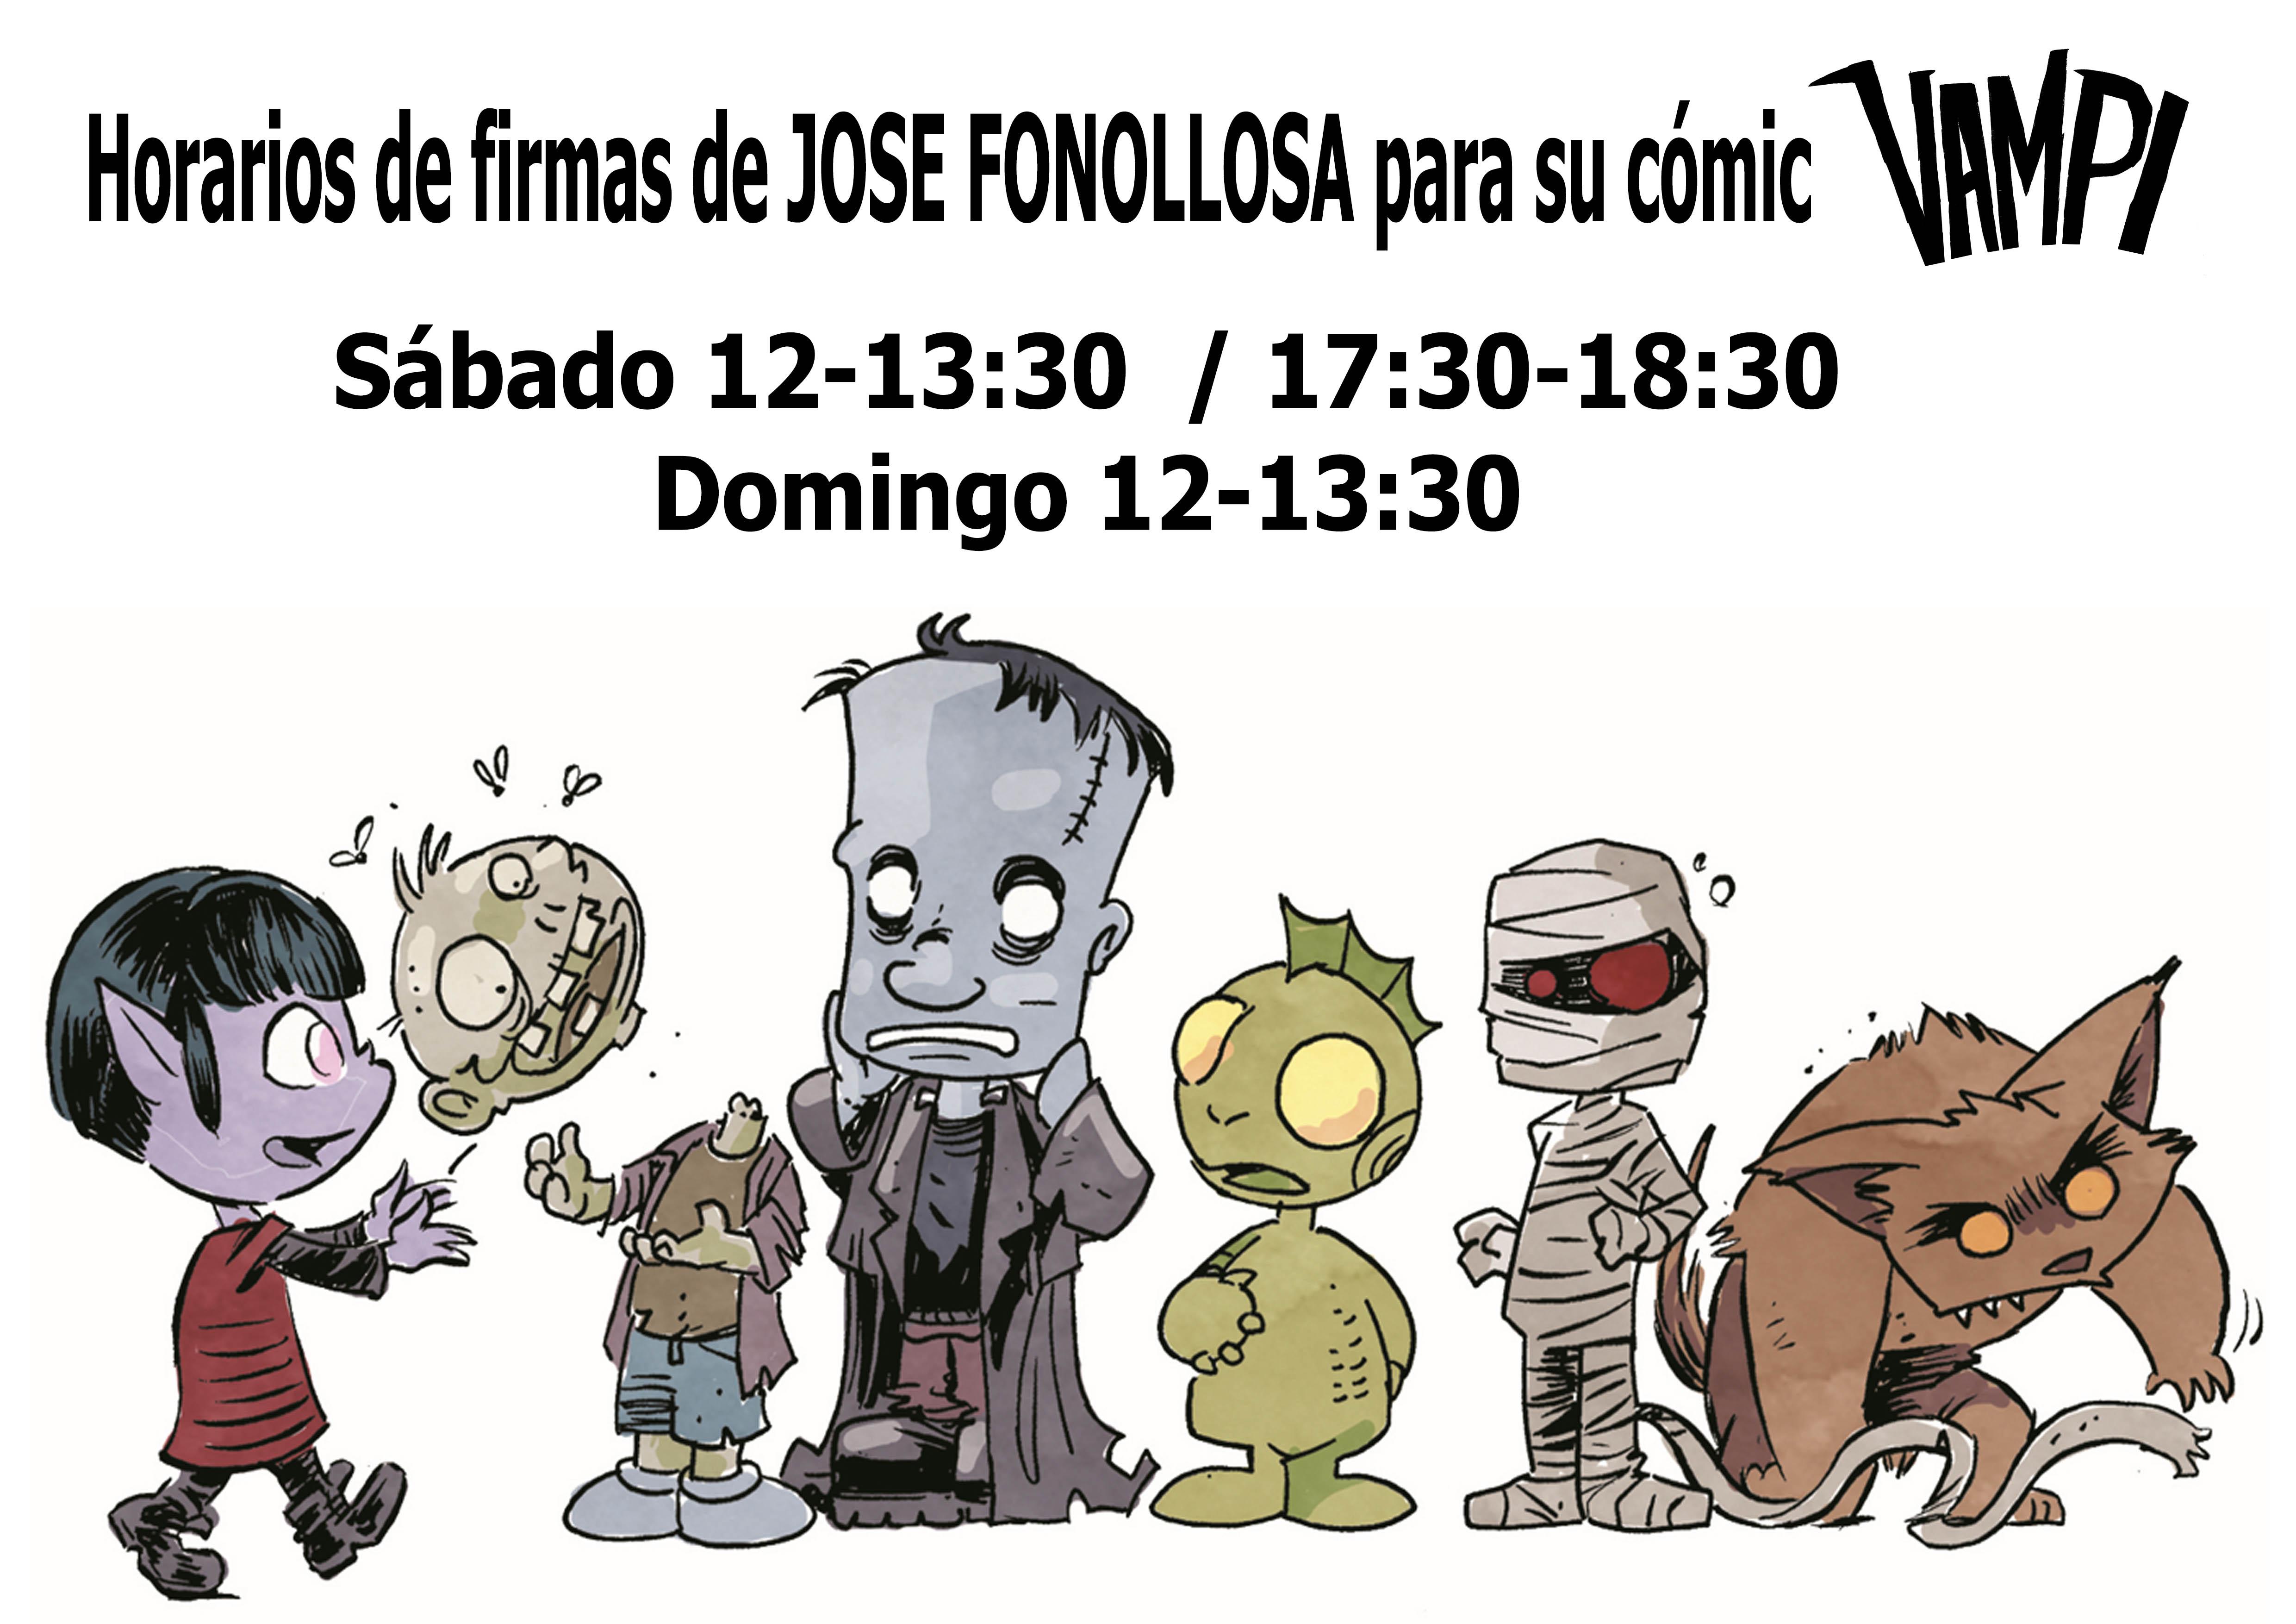 horarios firmas Jose Fonollosa Comic VAMPI